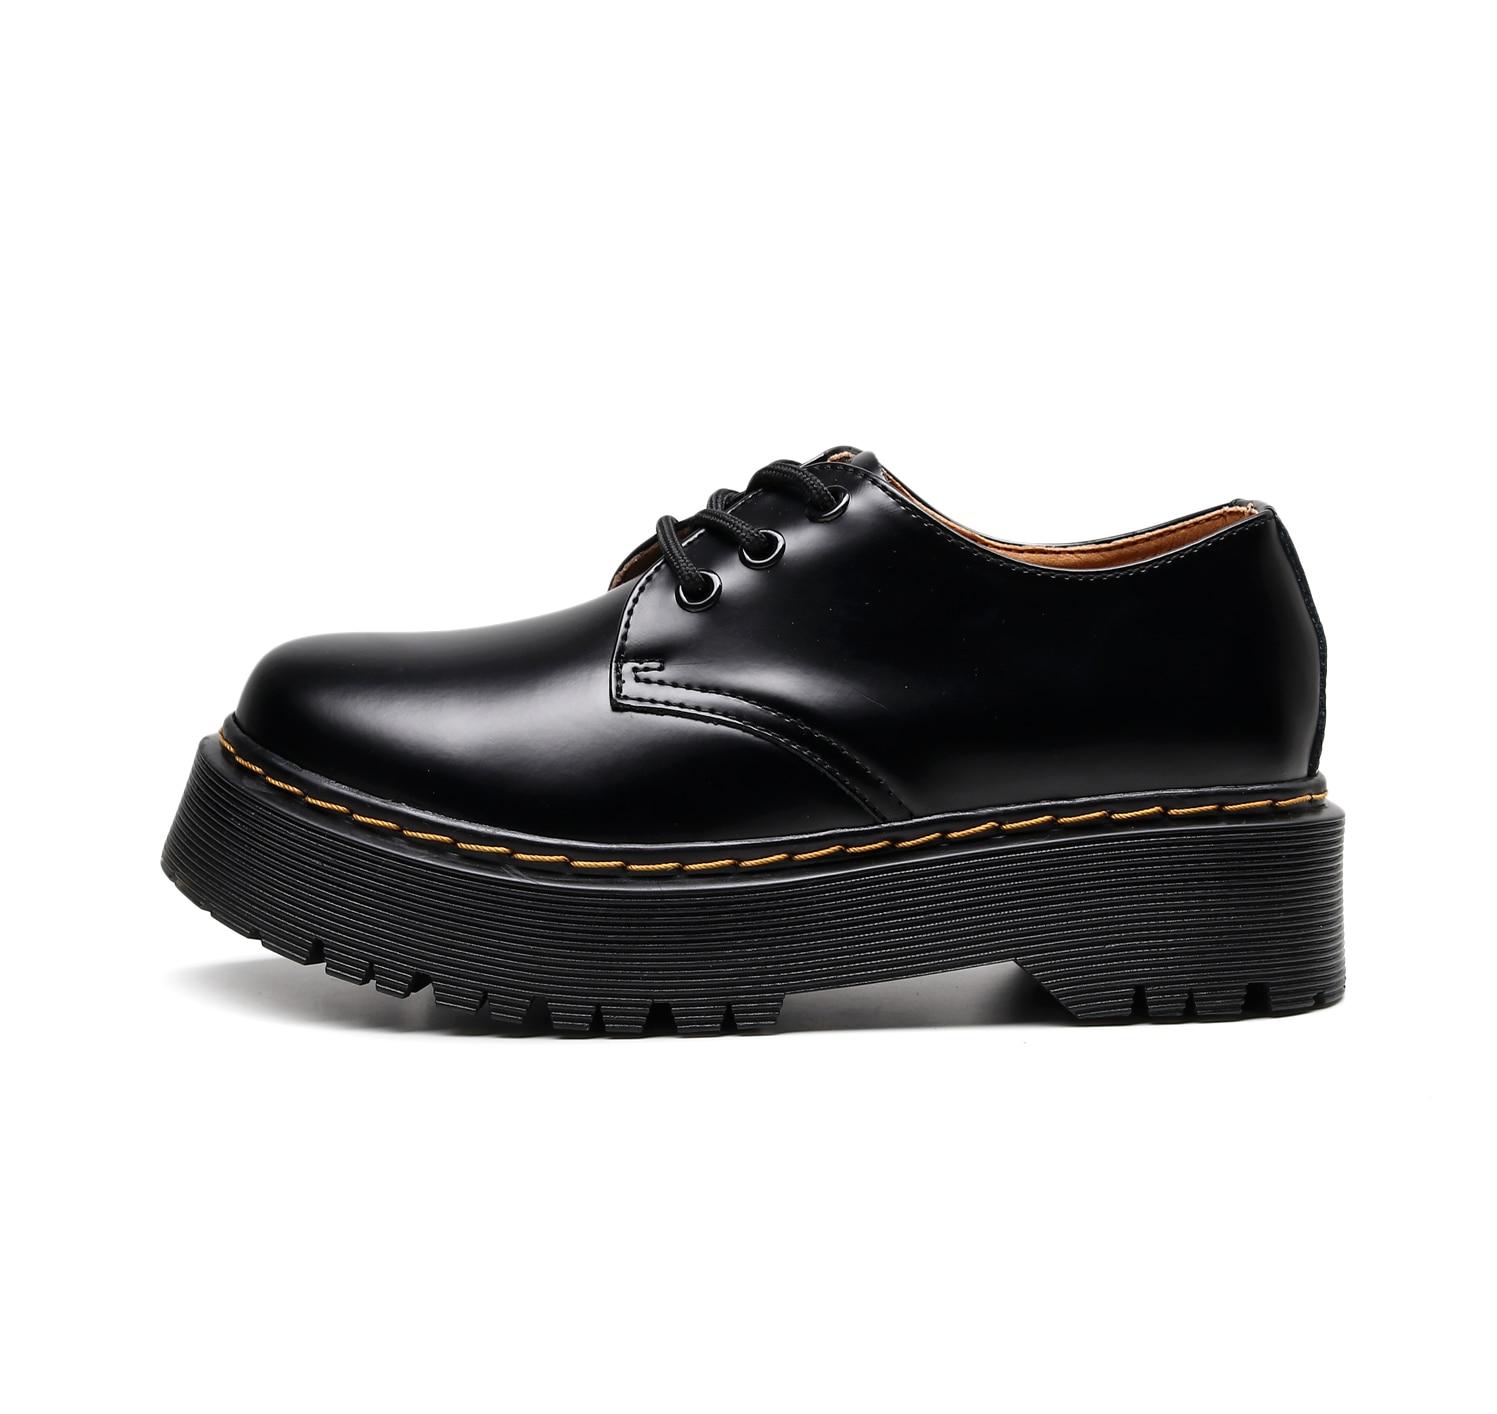 Women Shoes Oxford Platform Heels Casual Leather Fashion British Martens Rubber Hombre Ladies Dress Shoes